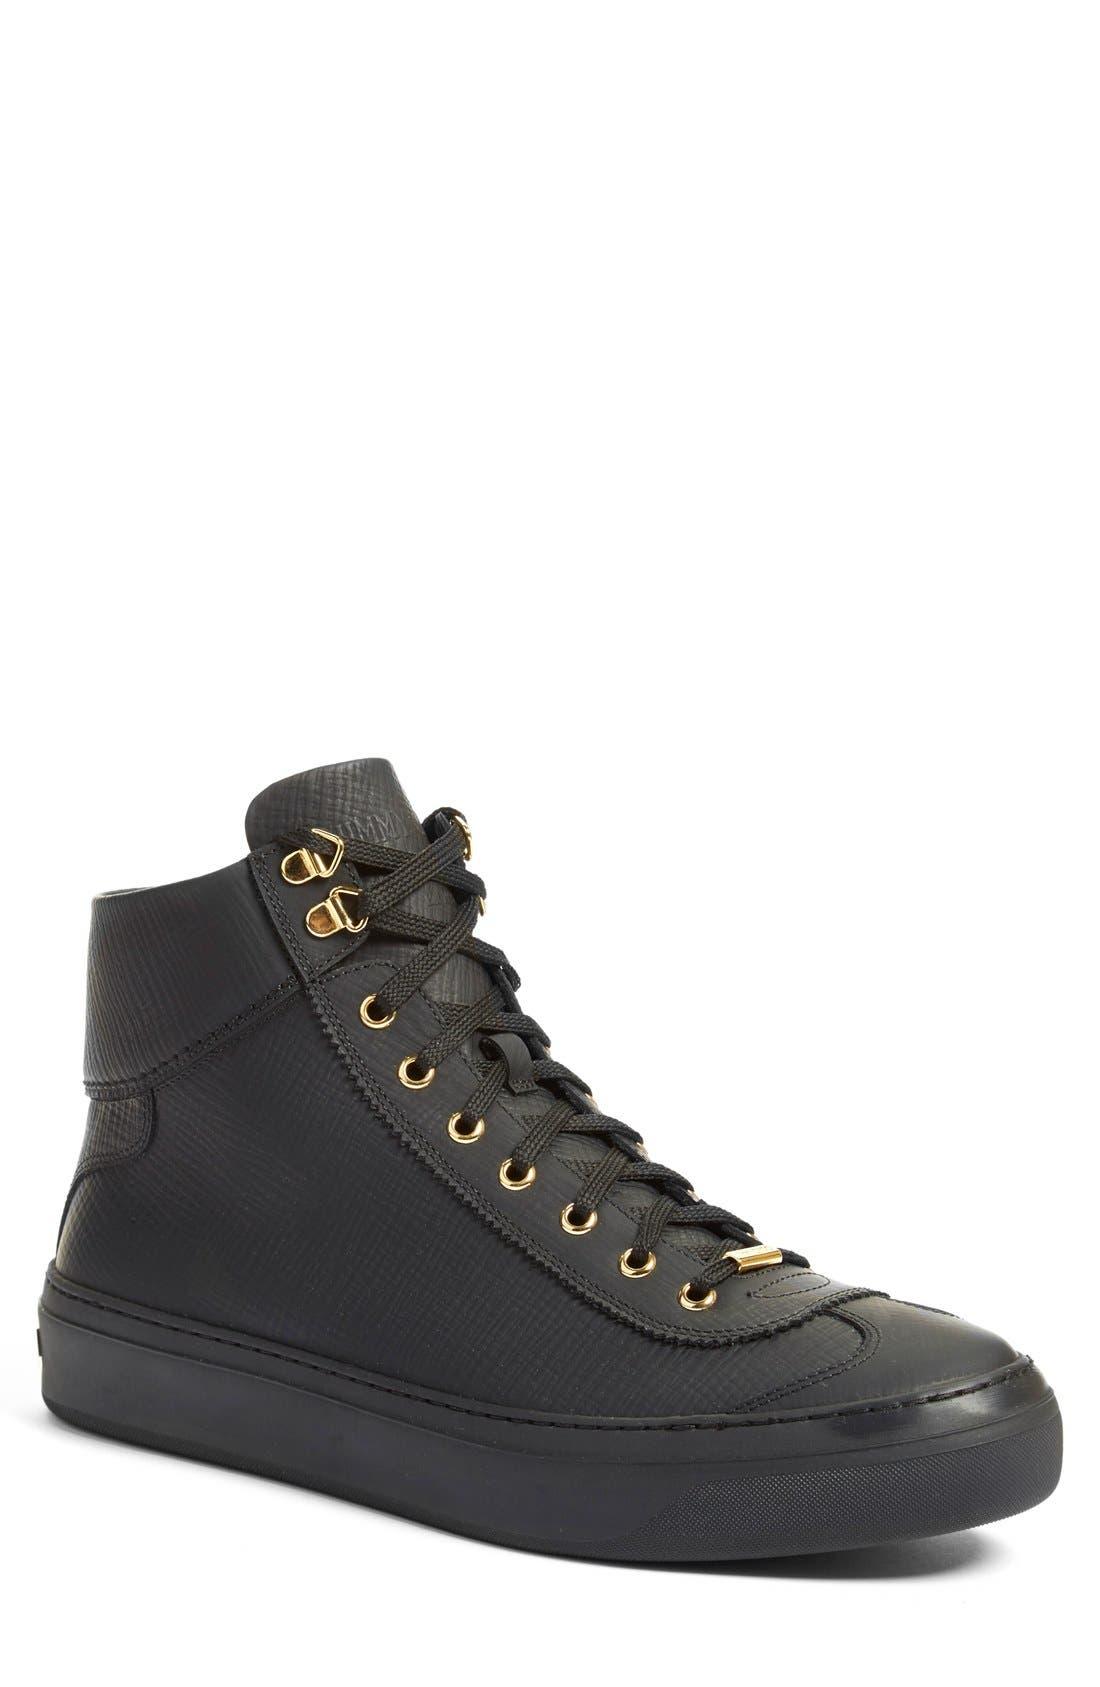 JIMMY CHOO Argyle High Top Sneaker